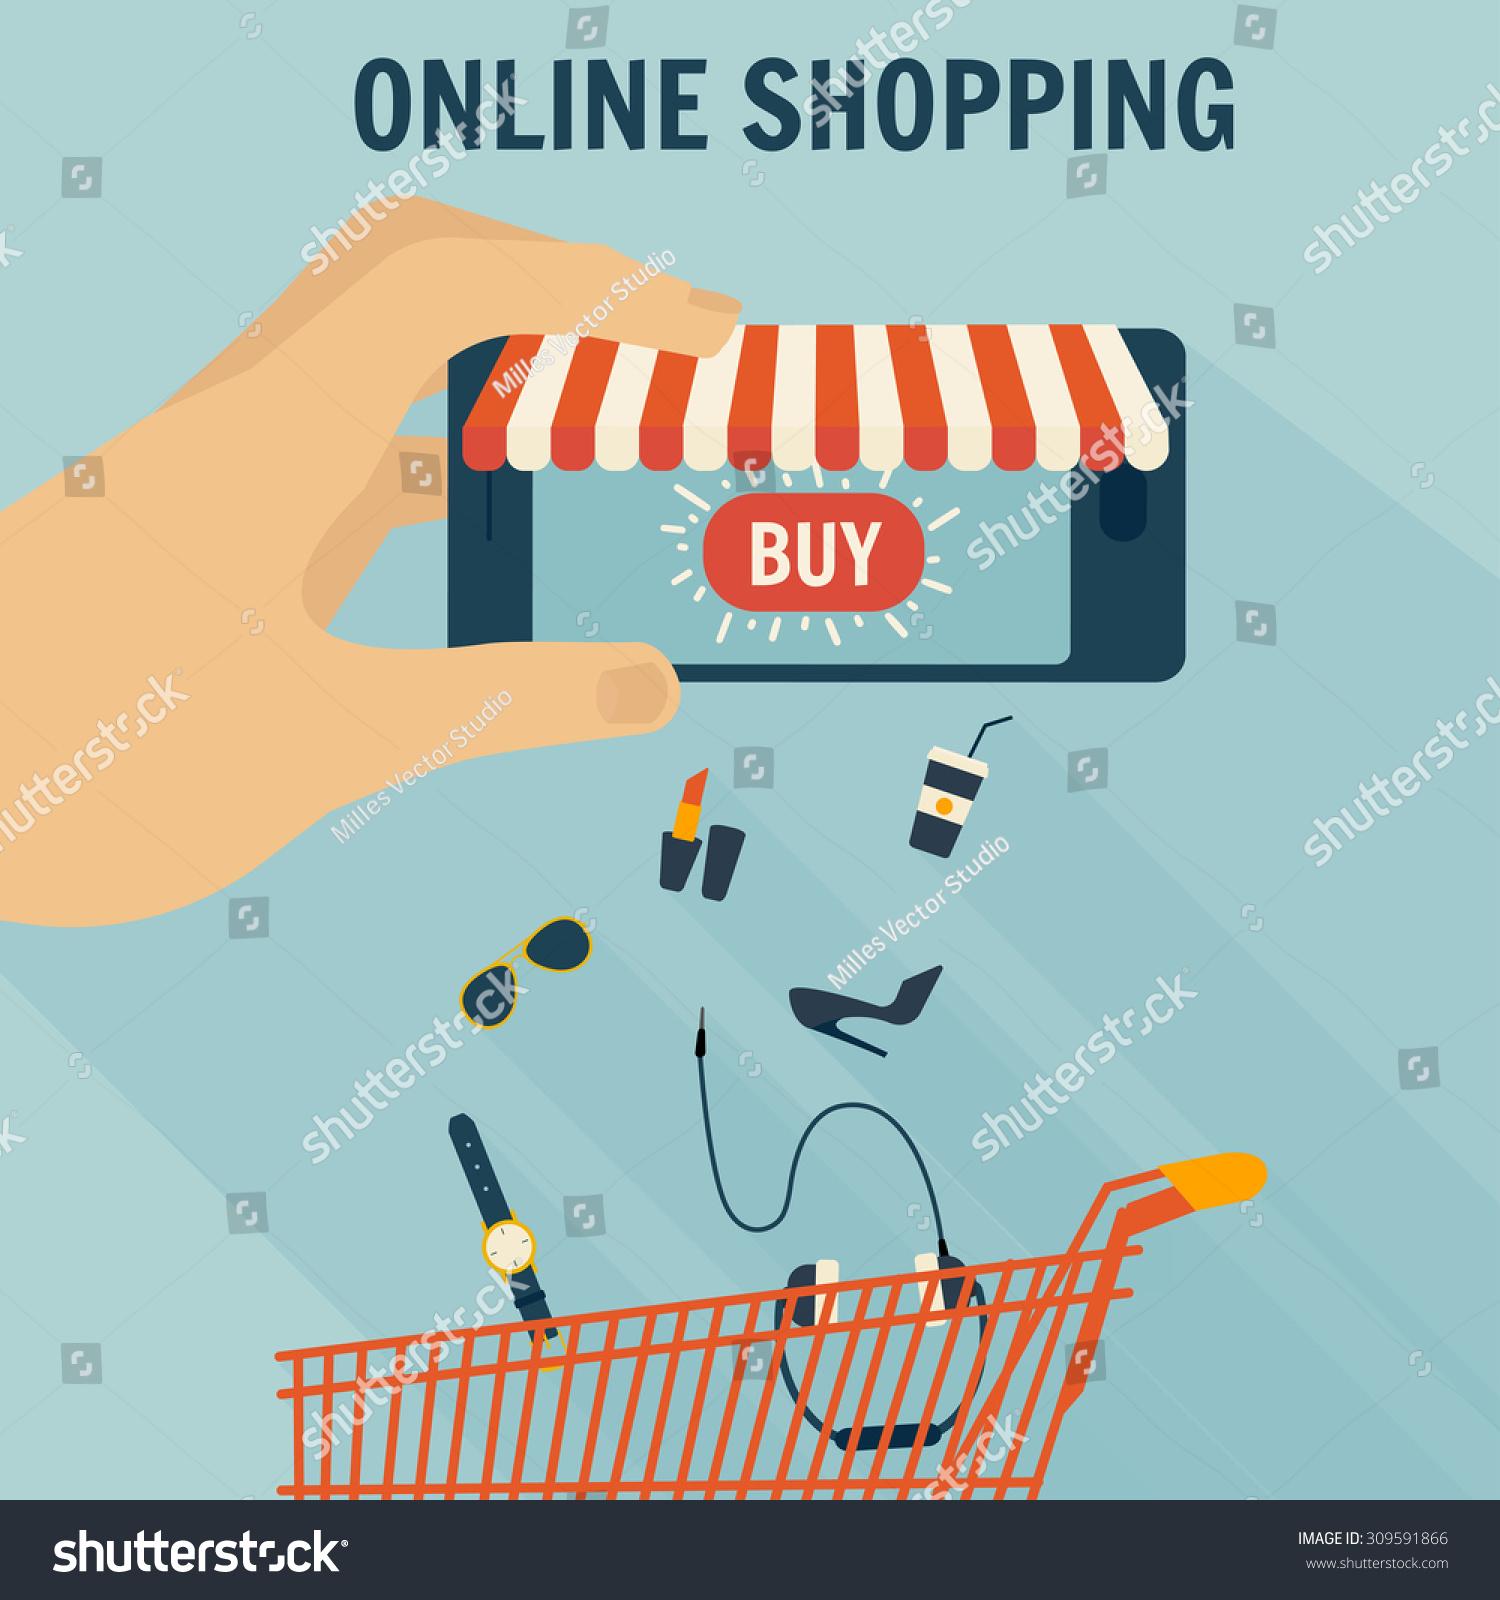 Mobile phone online store online shopping stock vector for Shop mobili online